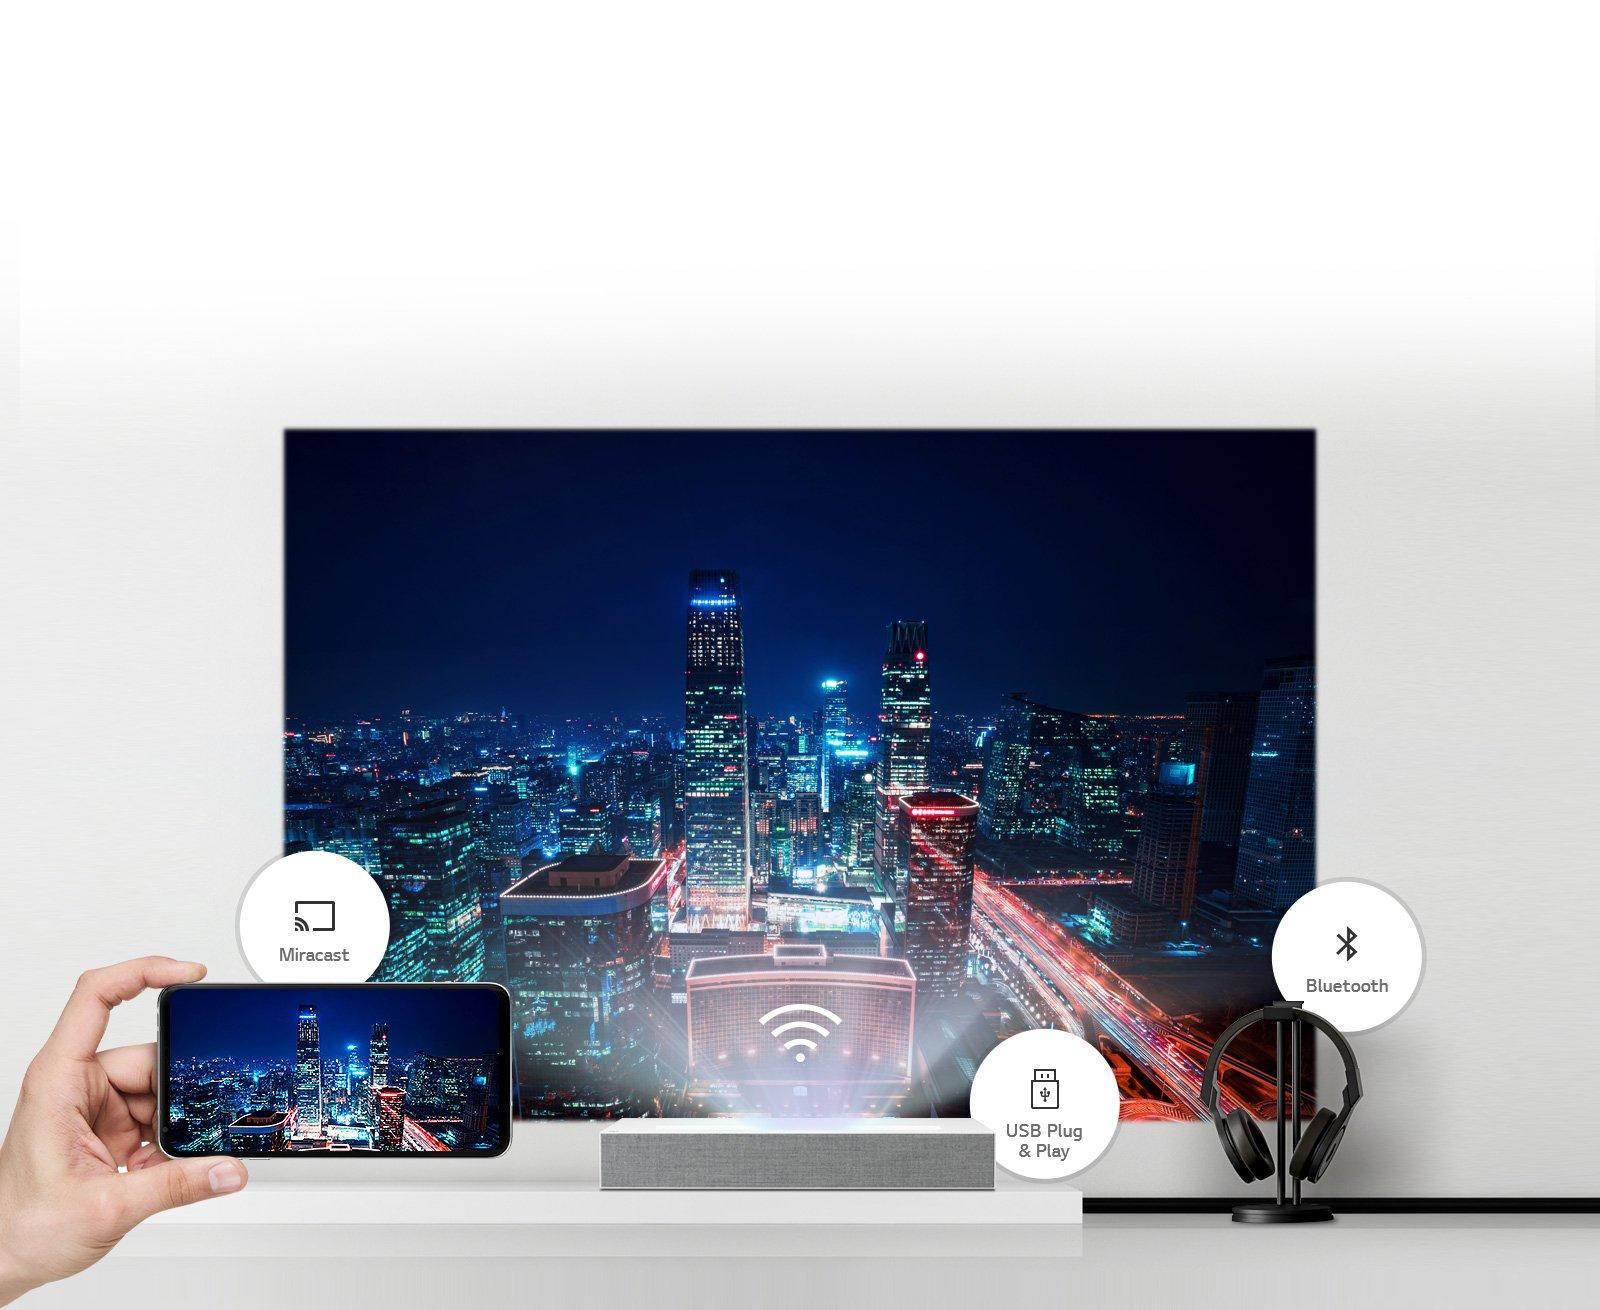 LG HU85LA 4K short-throw laser projector Discussion - LG webOS Smart